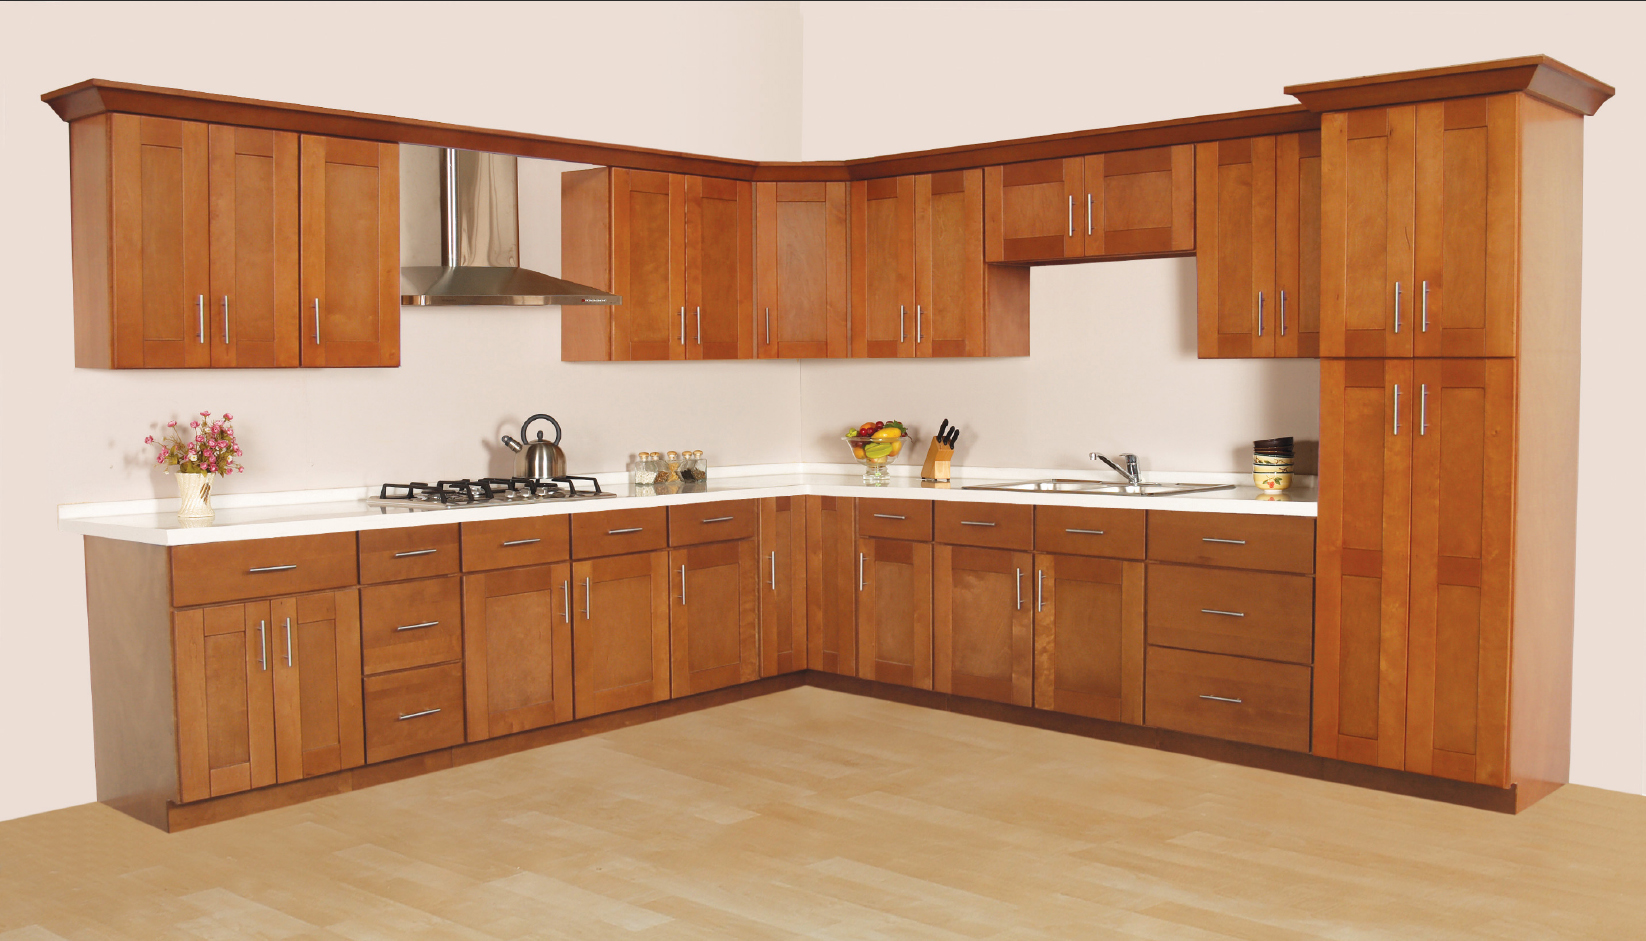 Kitchen wall cabinets Photo - 3